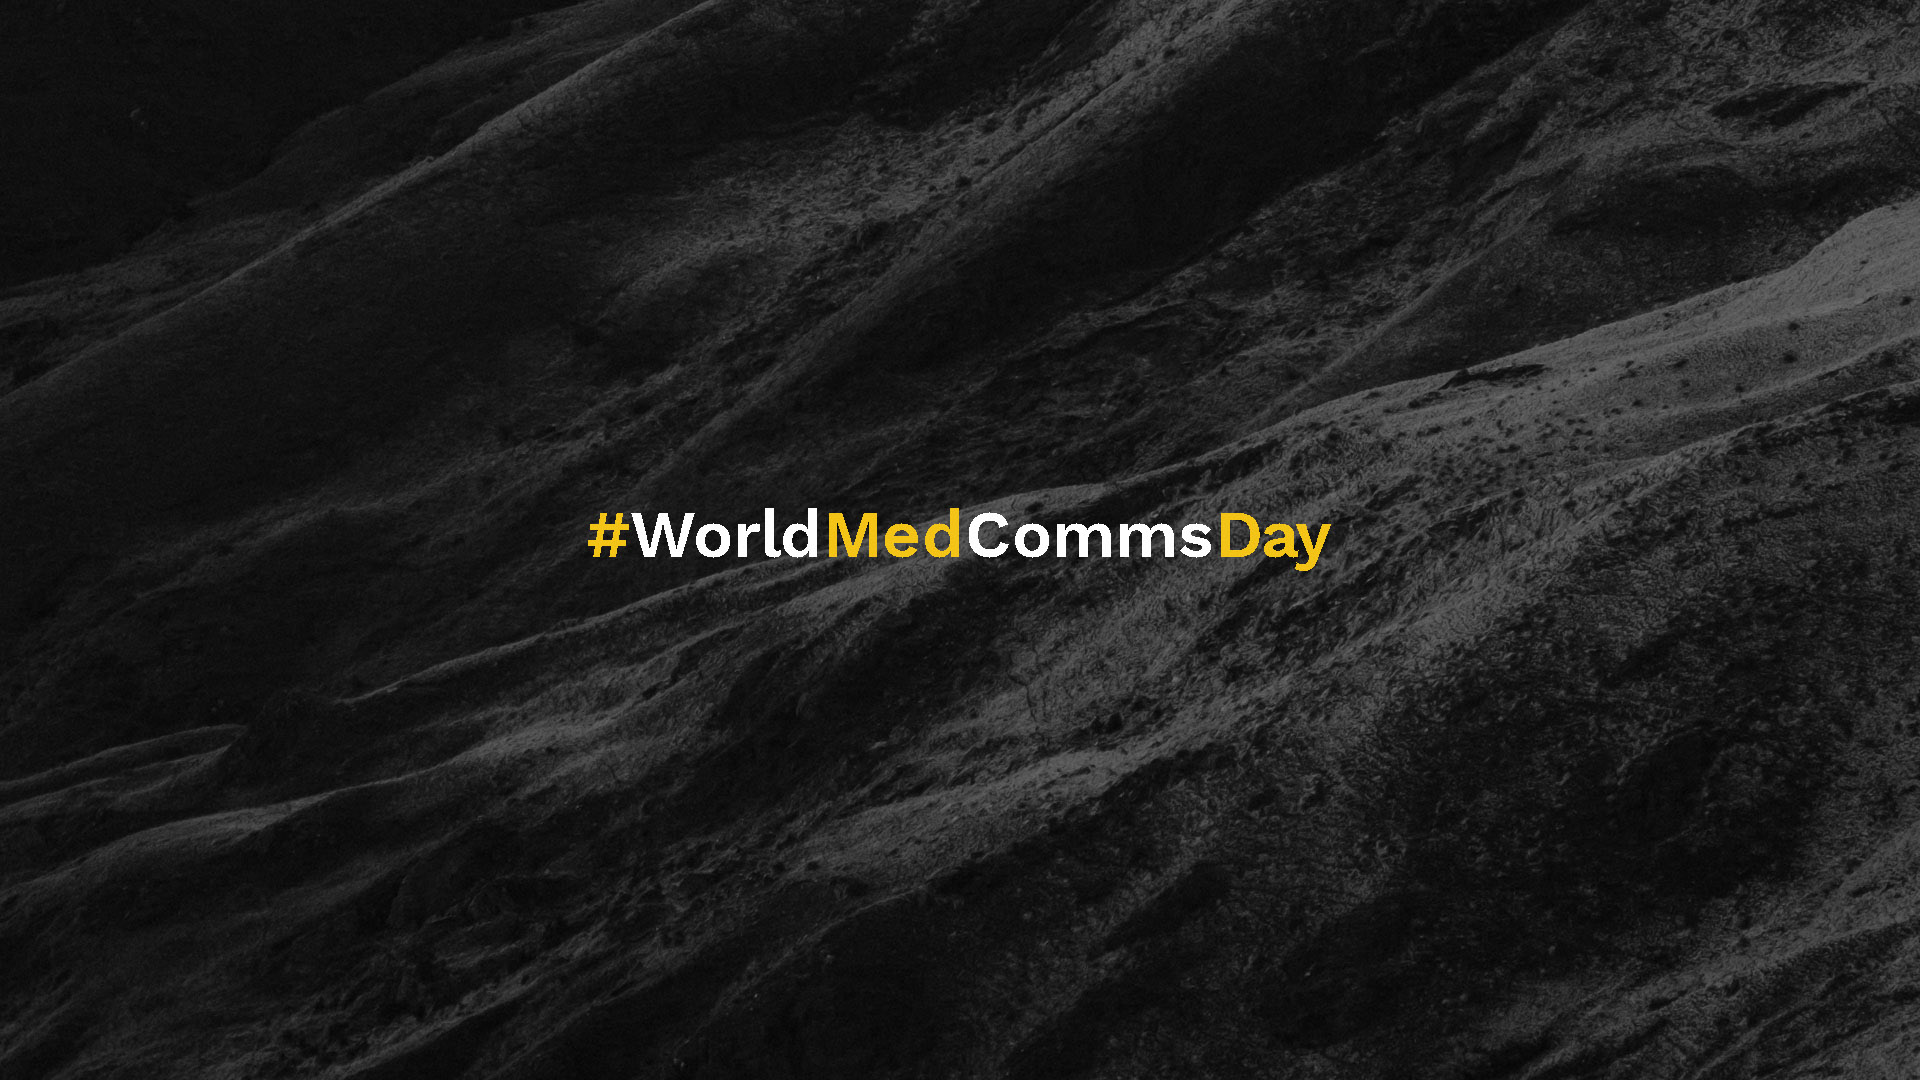 World MedComms Day